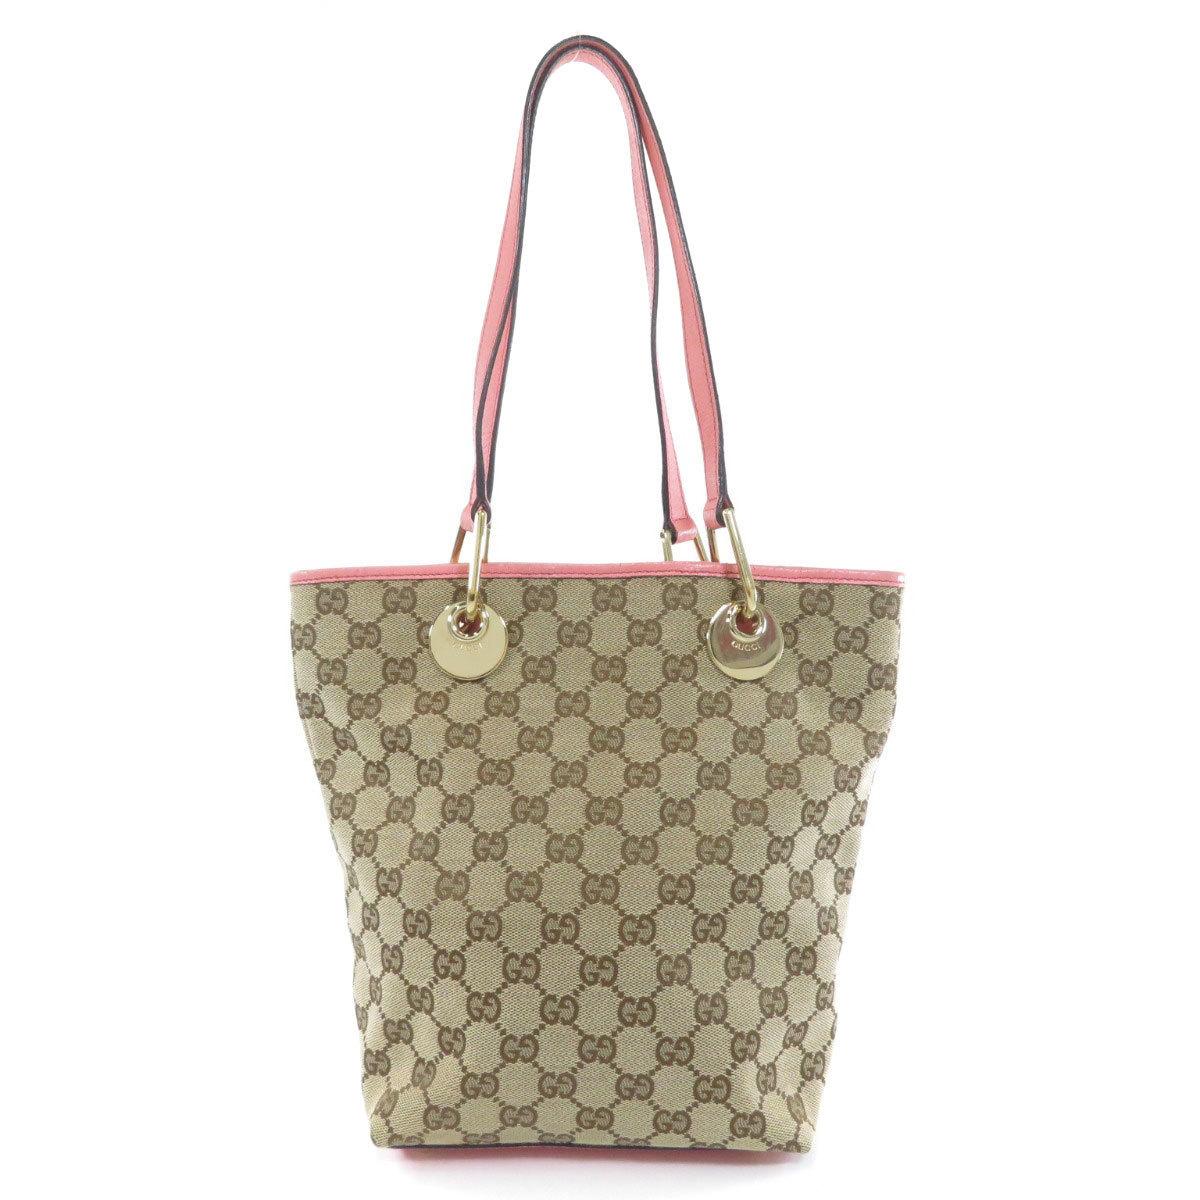 Gucci 120840 GG Tote Bag Canvas Ladies